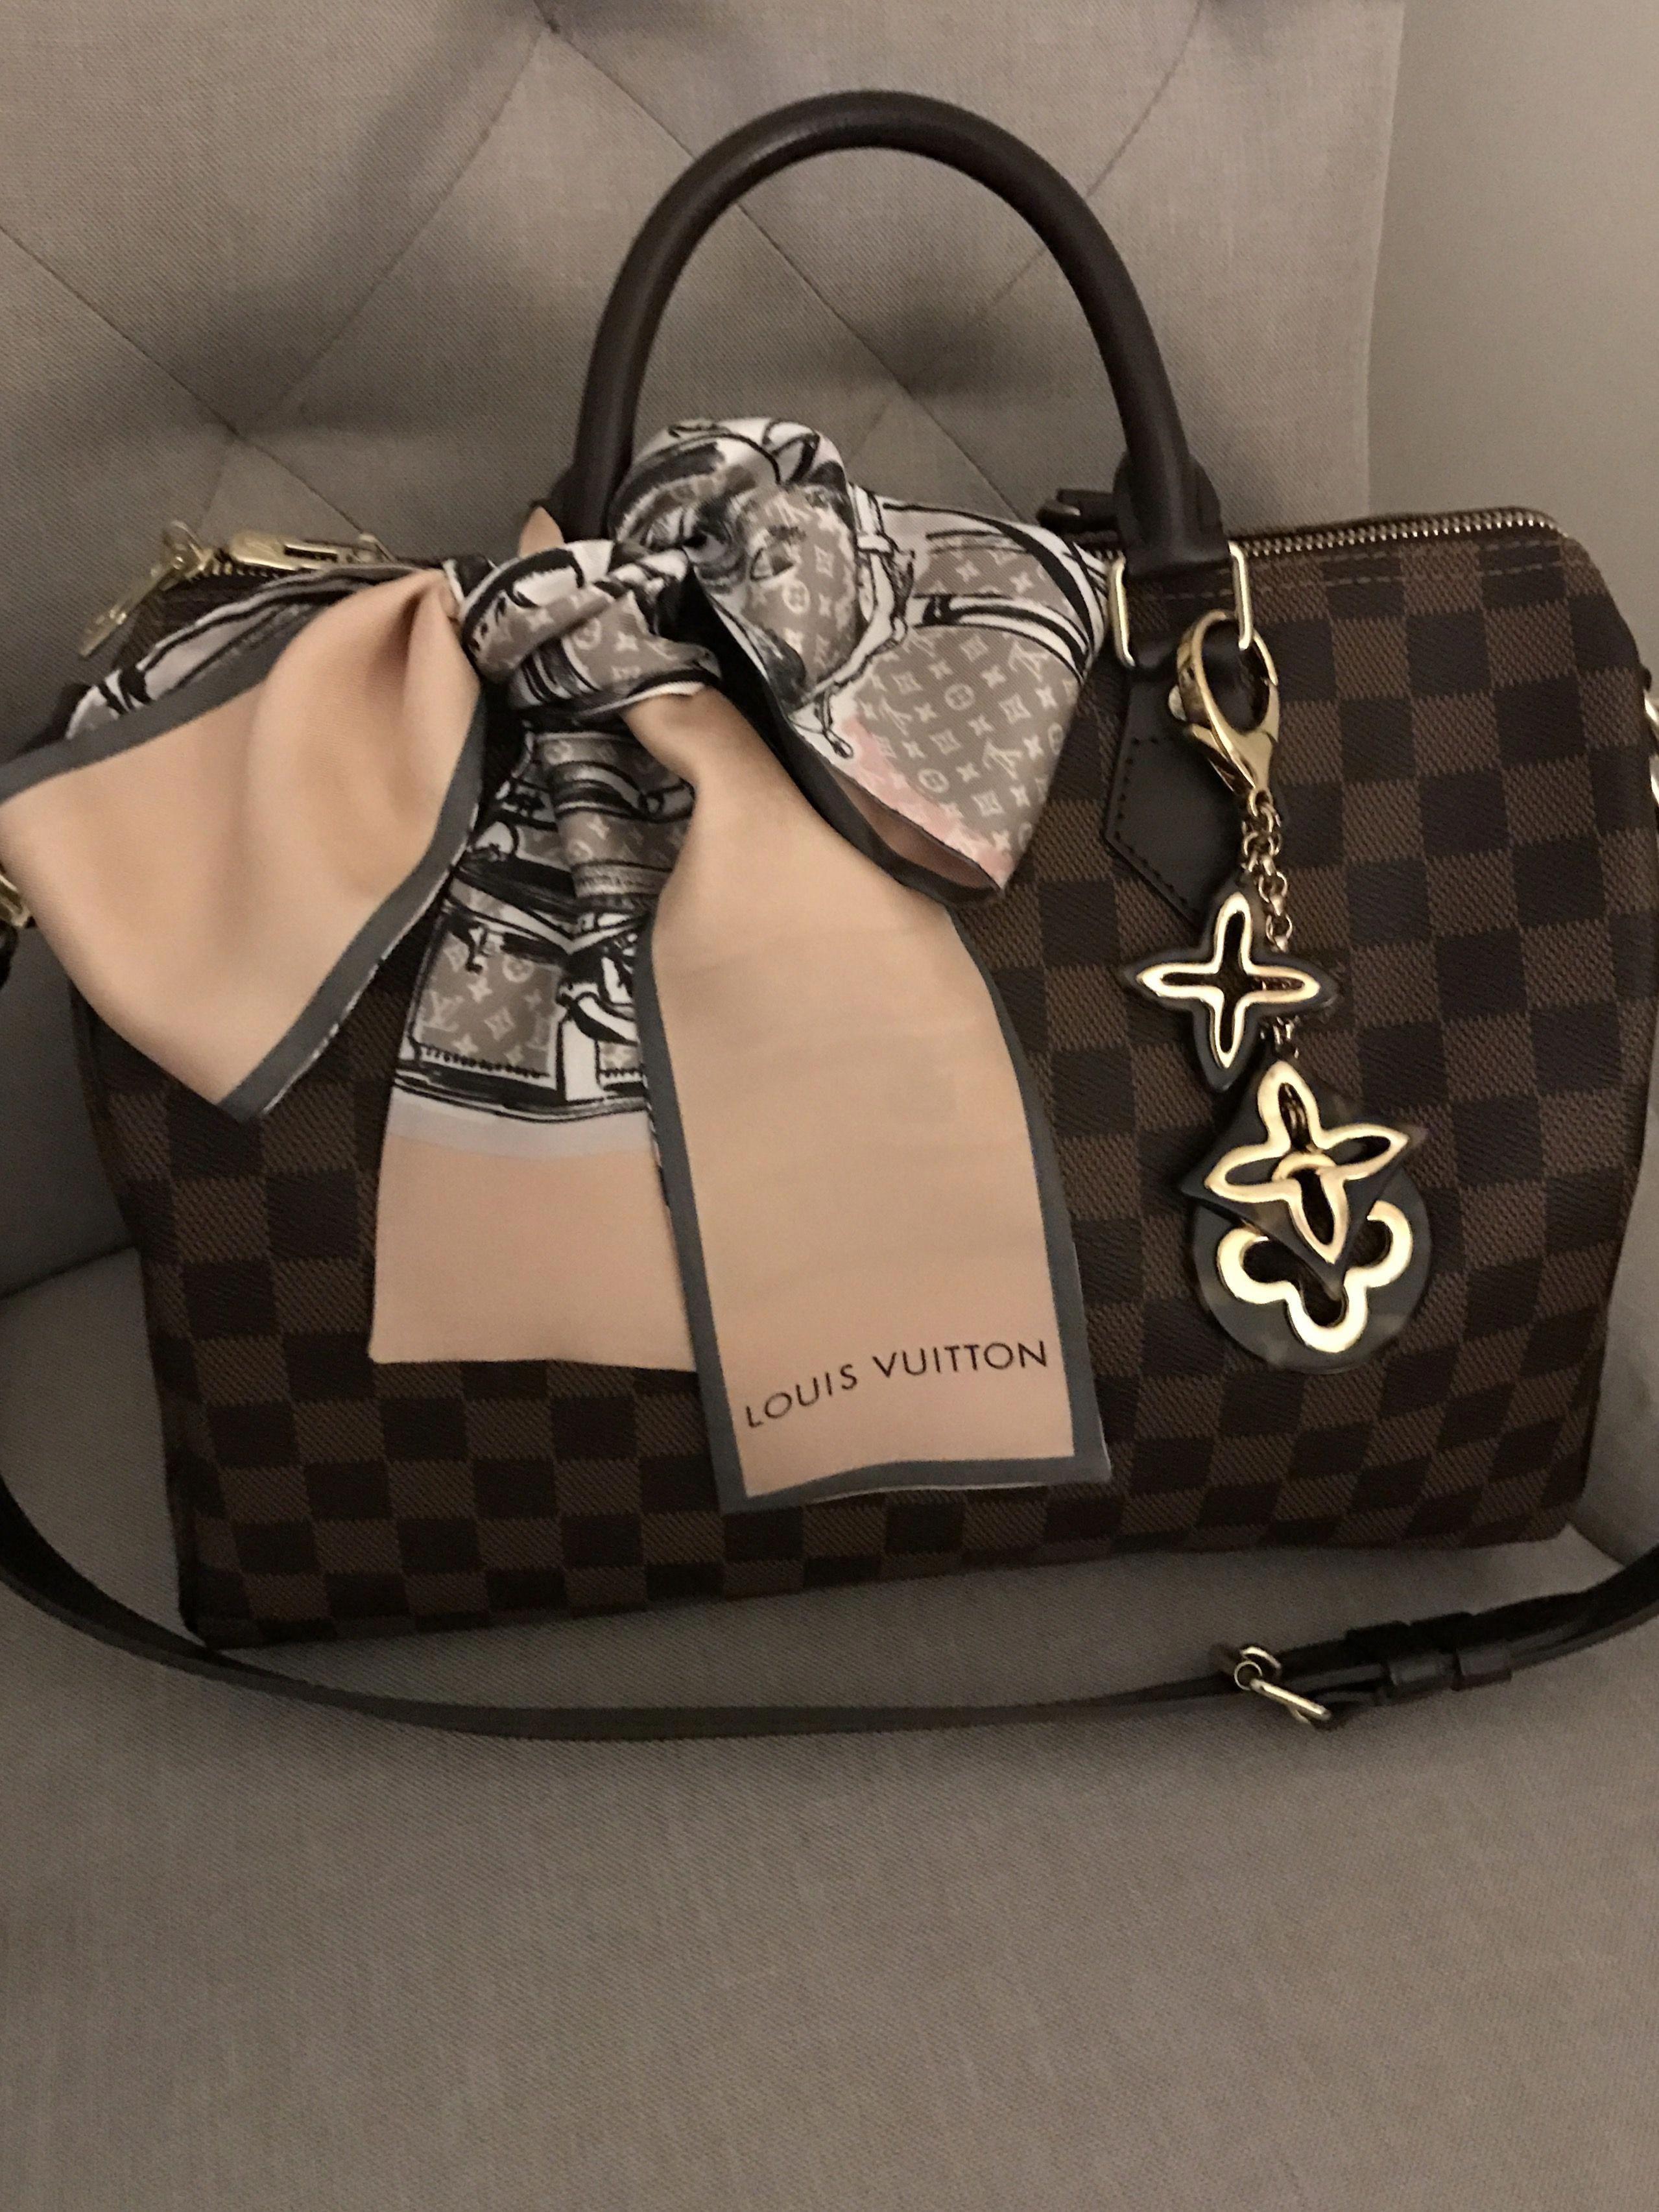 f1c138f037f9 Louis Vuitton speedy b 30 damier ebene.... so pretty with lv bandeau and  charm  Louisvuittonhandbags